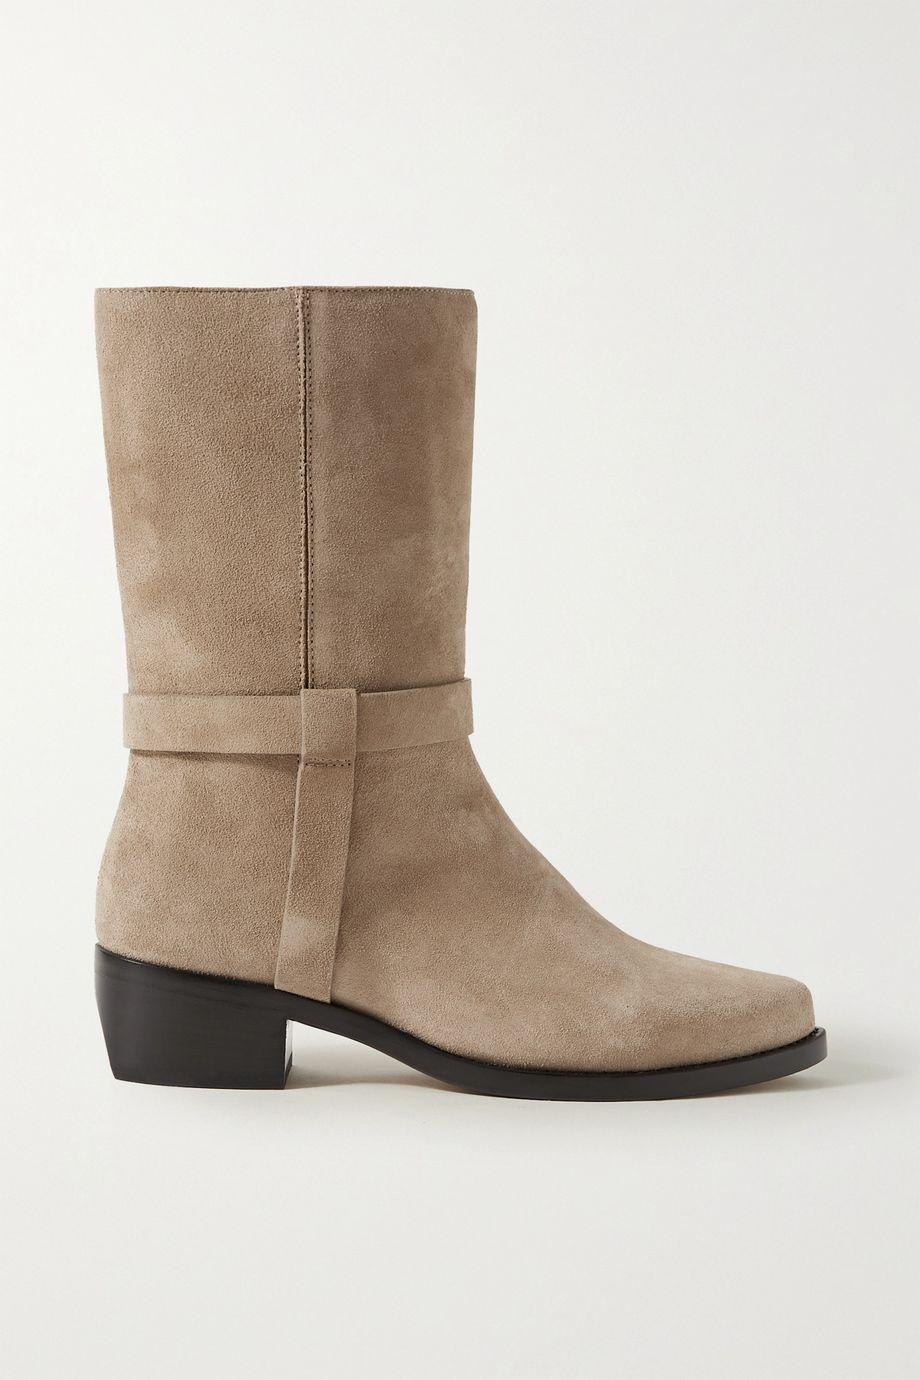 LEGRES Suede boots